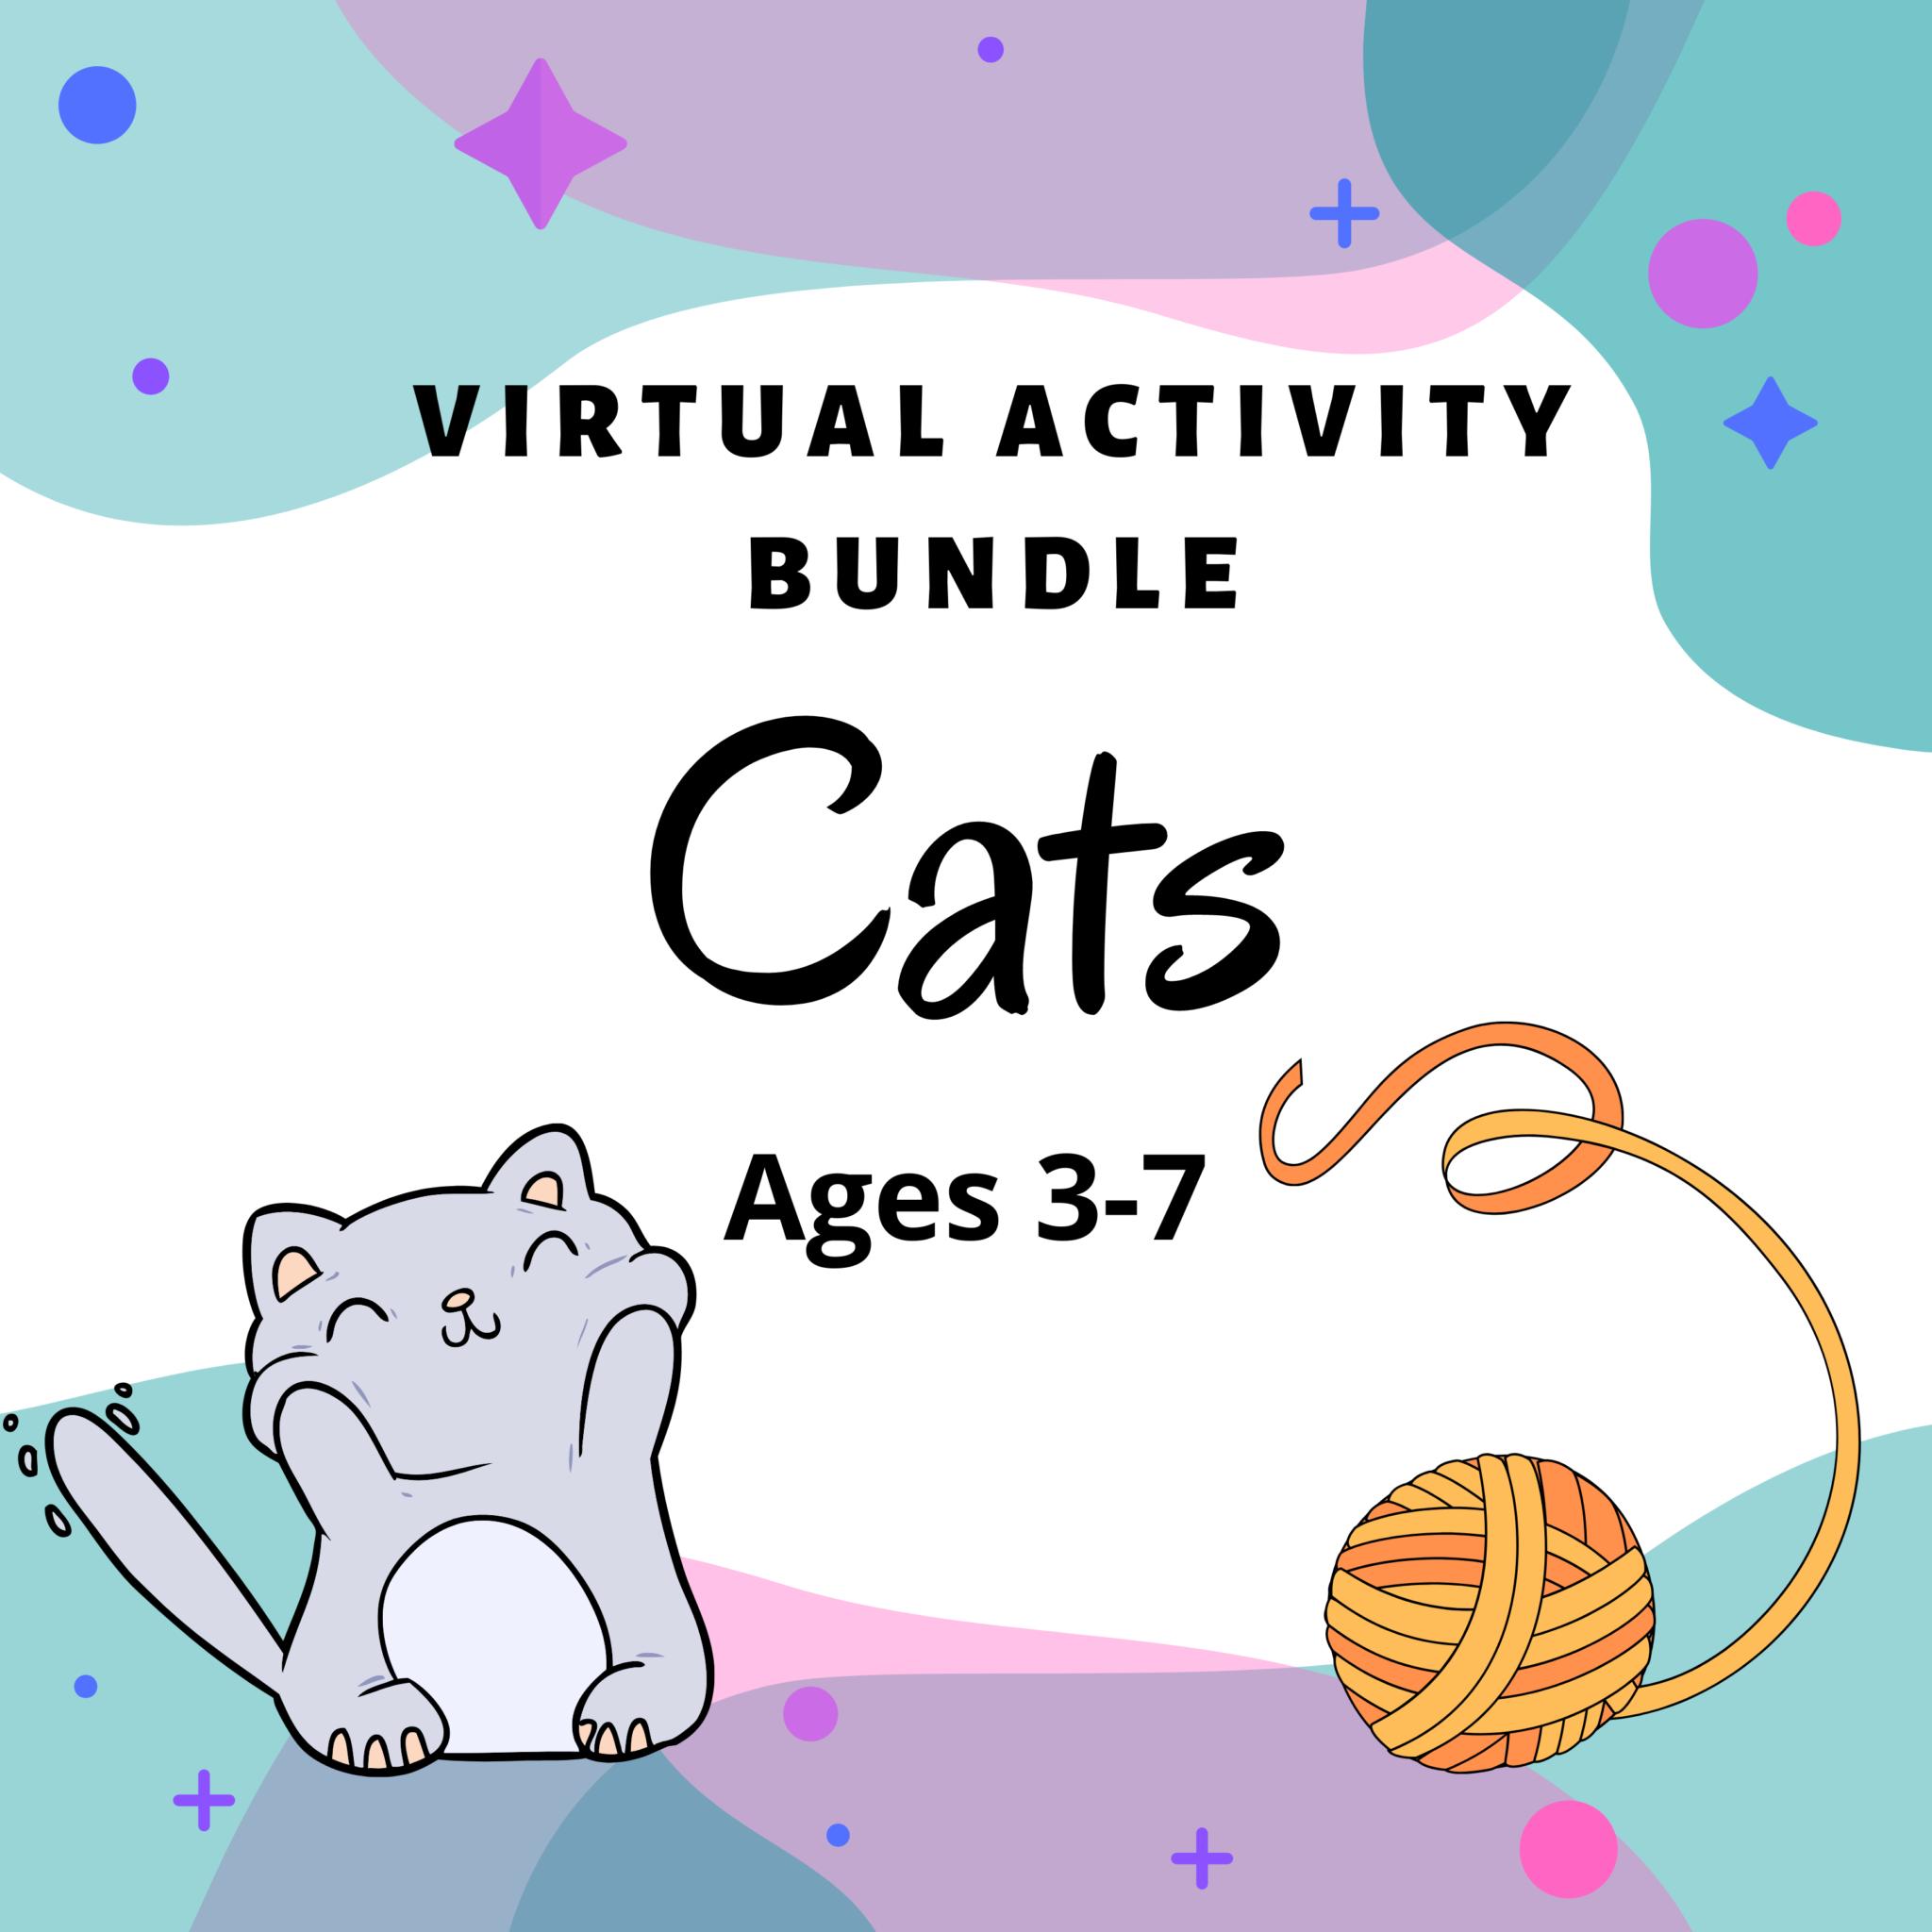 Virtual Activity Bundle Cats